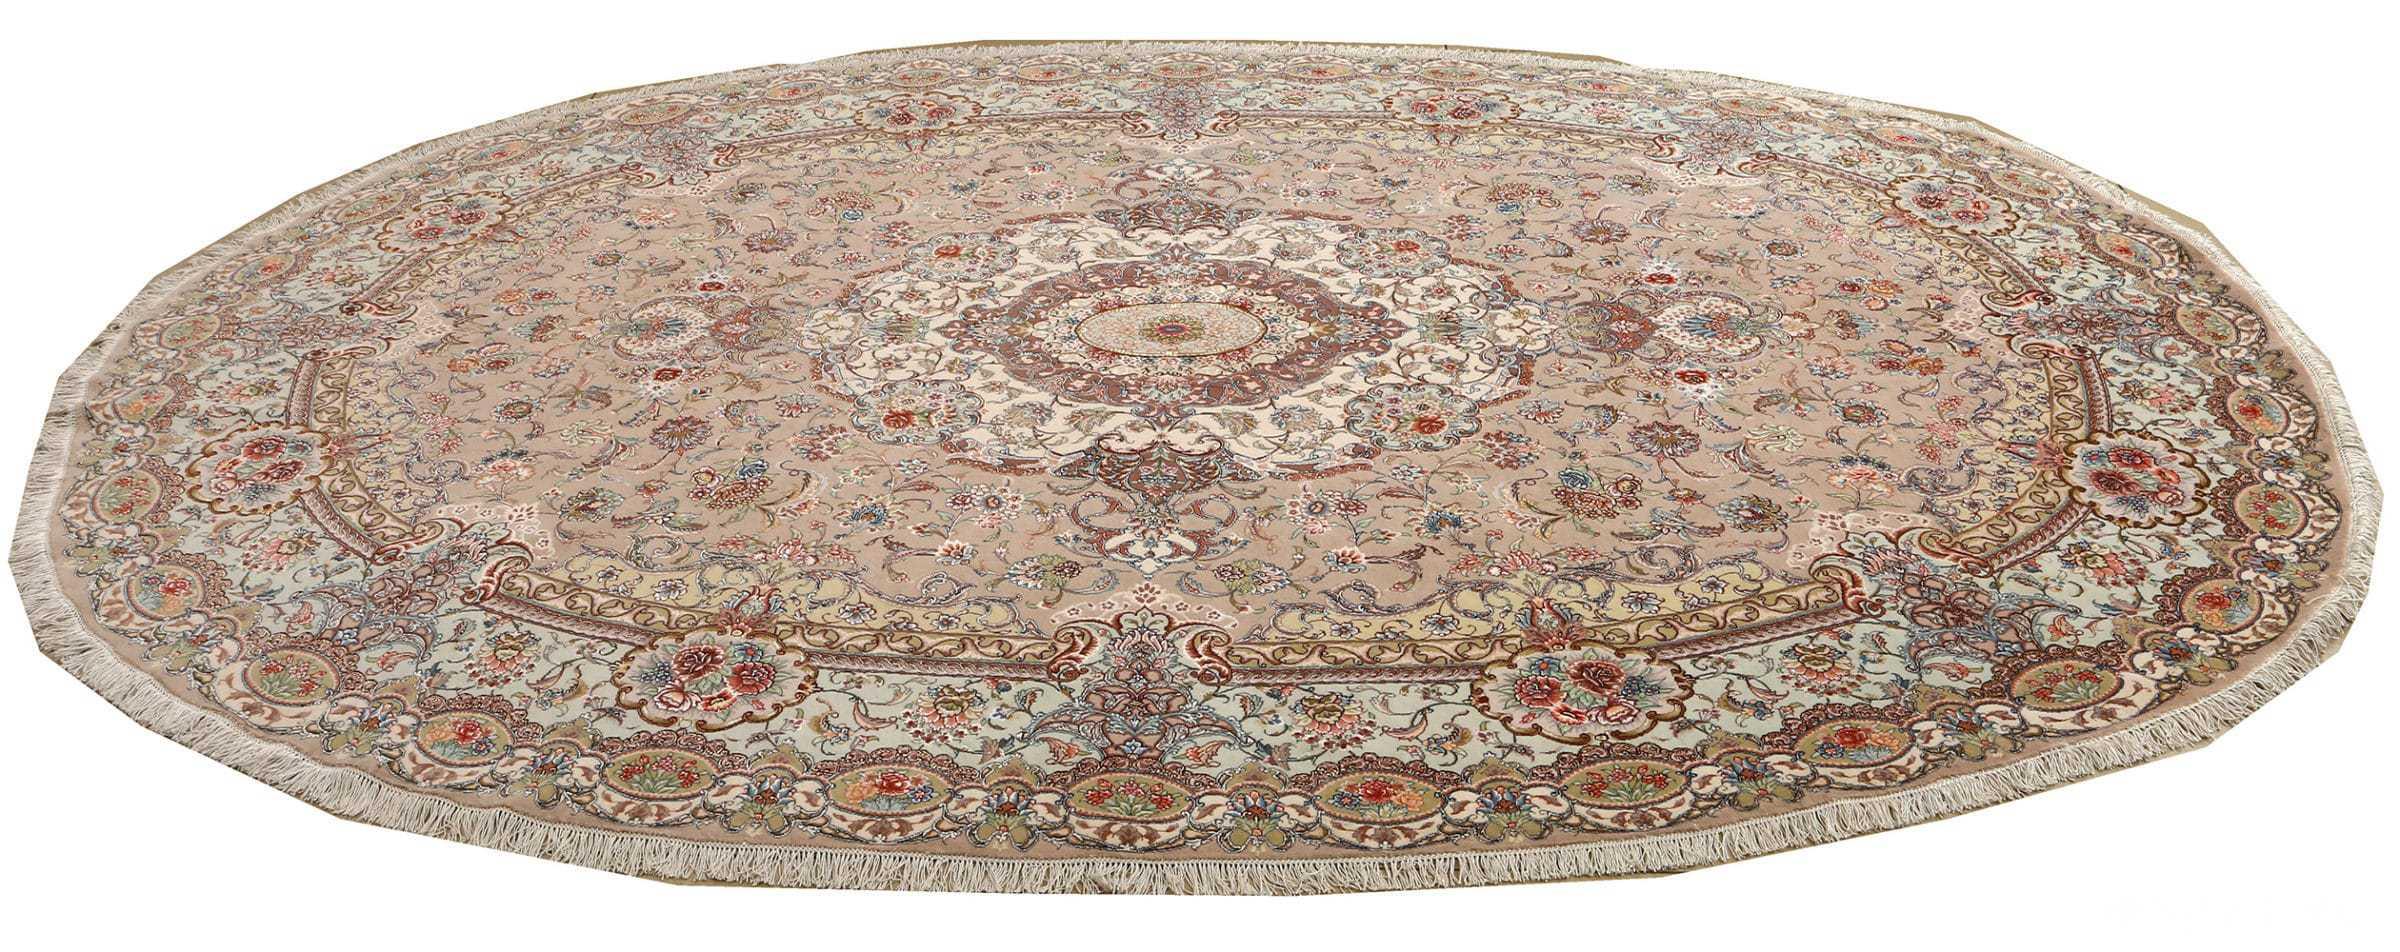 oval vintage tabriz rug 51135 horizontal Nazmiyal